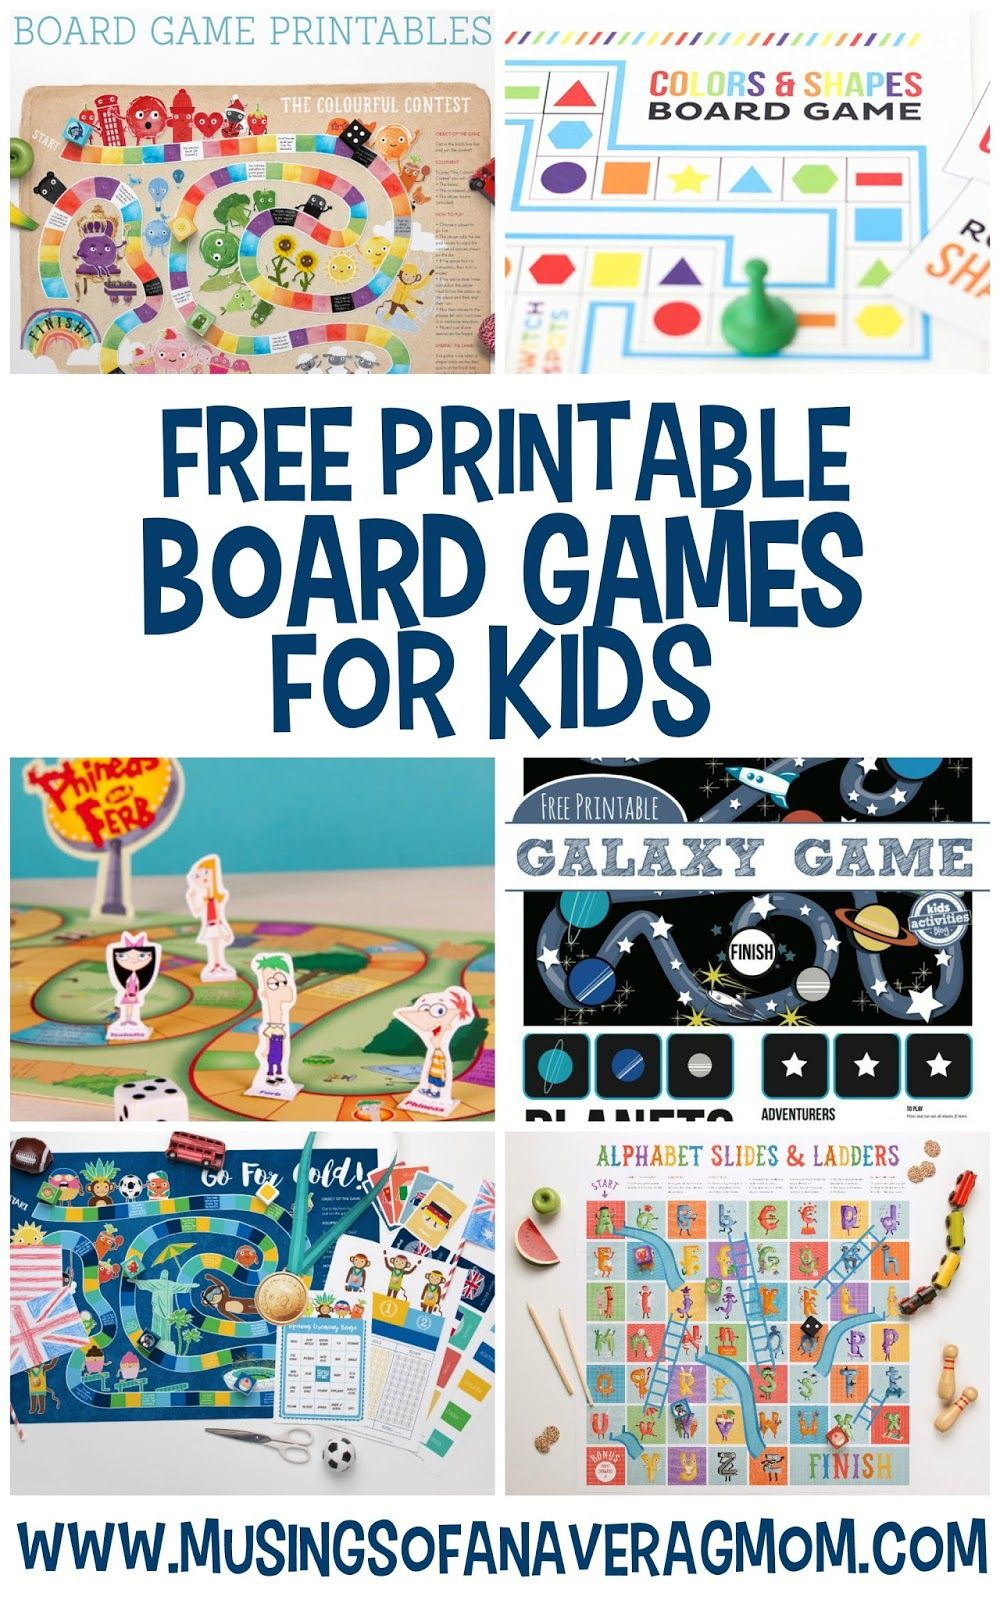 Free Printable Board Games Printable Board Games Educational Board Games Free Games For Kids